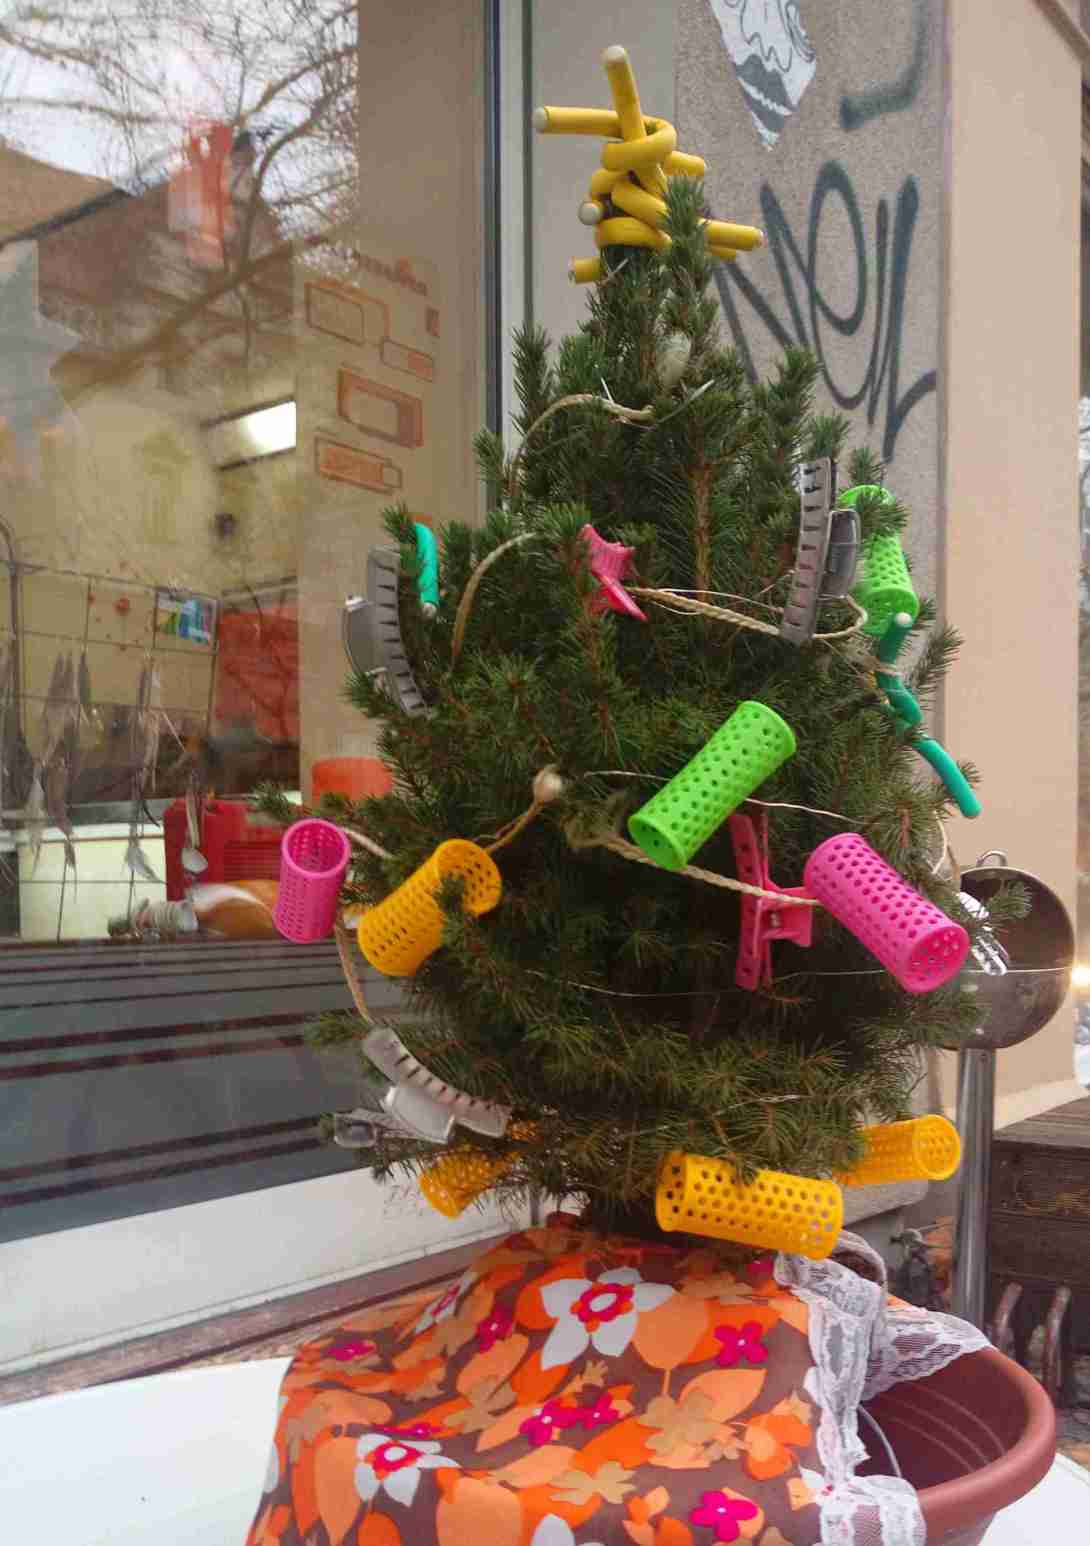 Weihnachtsbaum Christmas Tree at the hairdresser